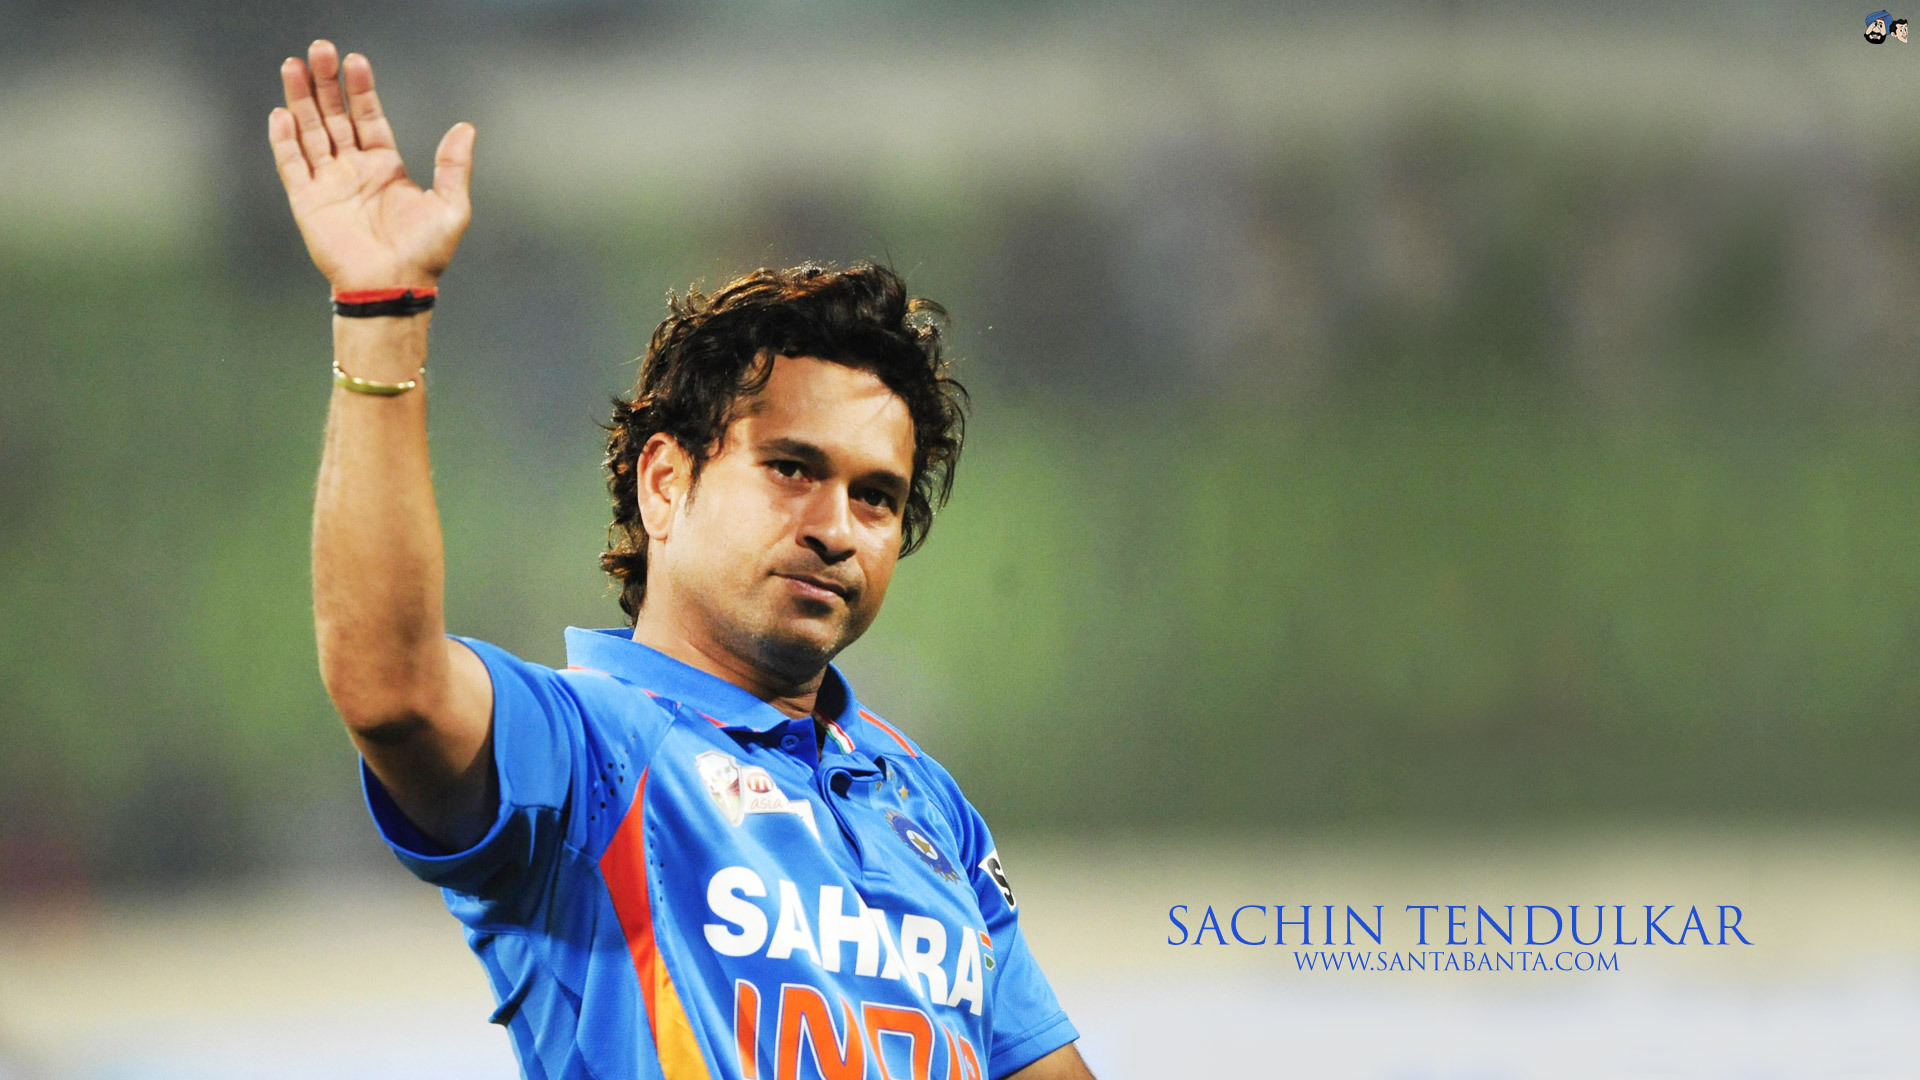 Sachin Tendulkar Images